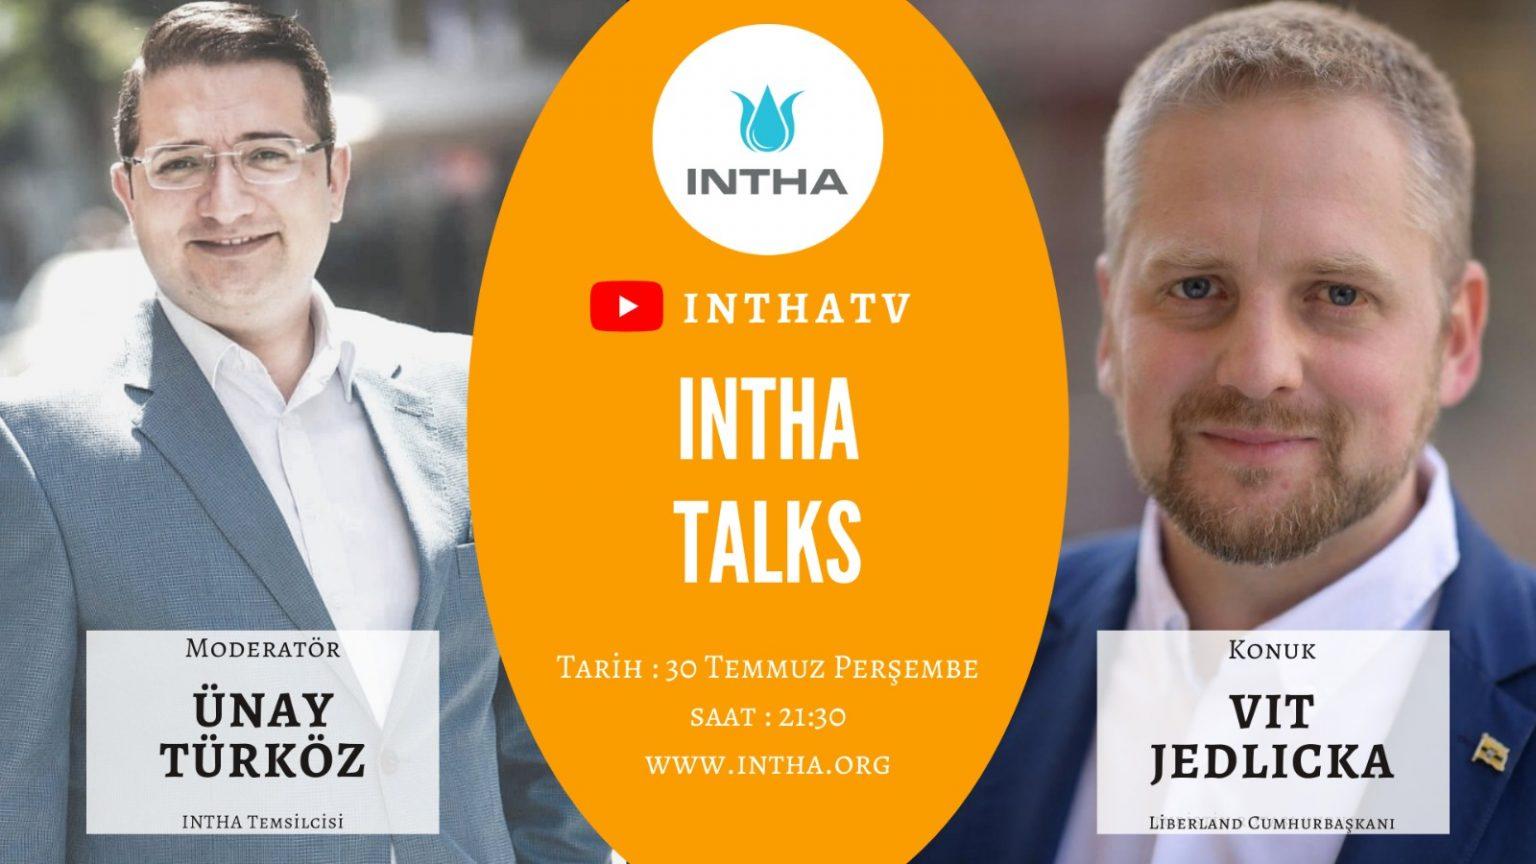 Liberland Cumhurbaşkanı Vit Jedlicka INTHA'nın Konuğu Oluyor